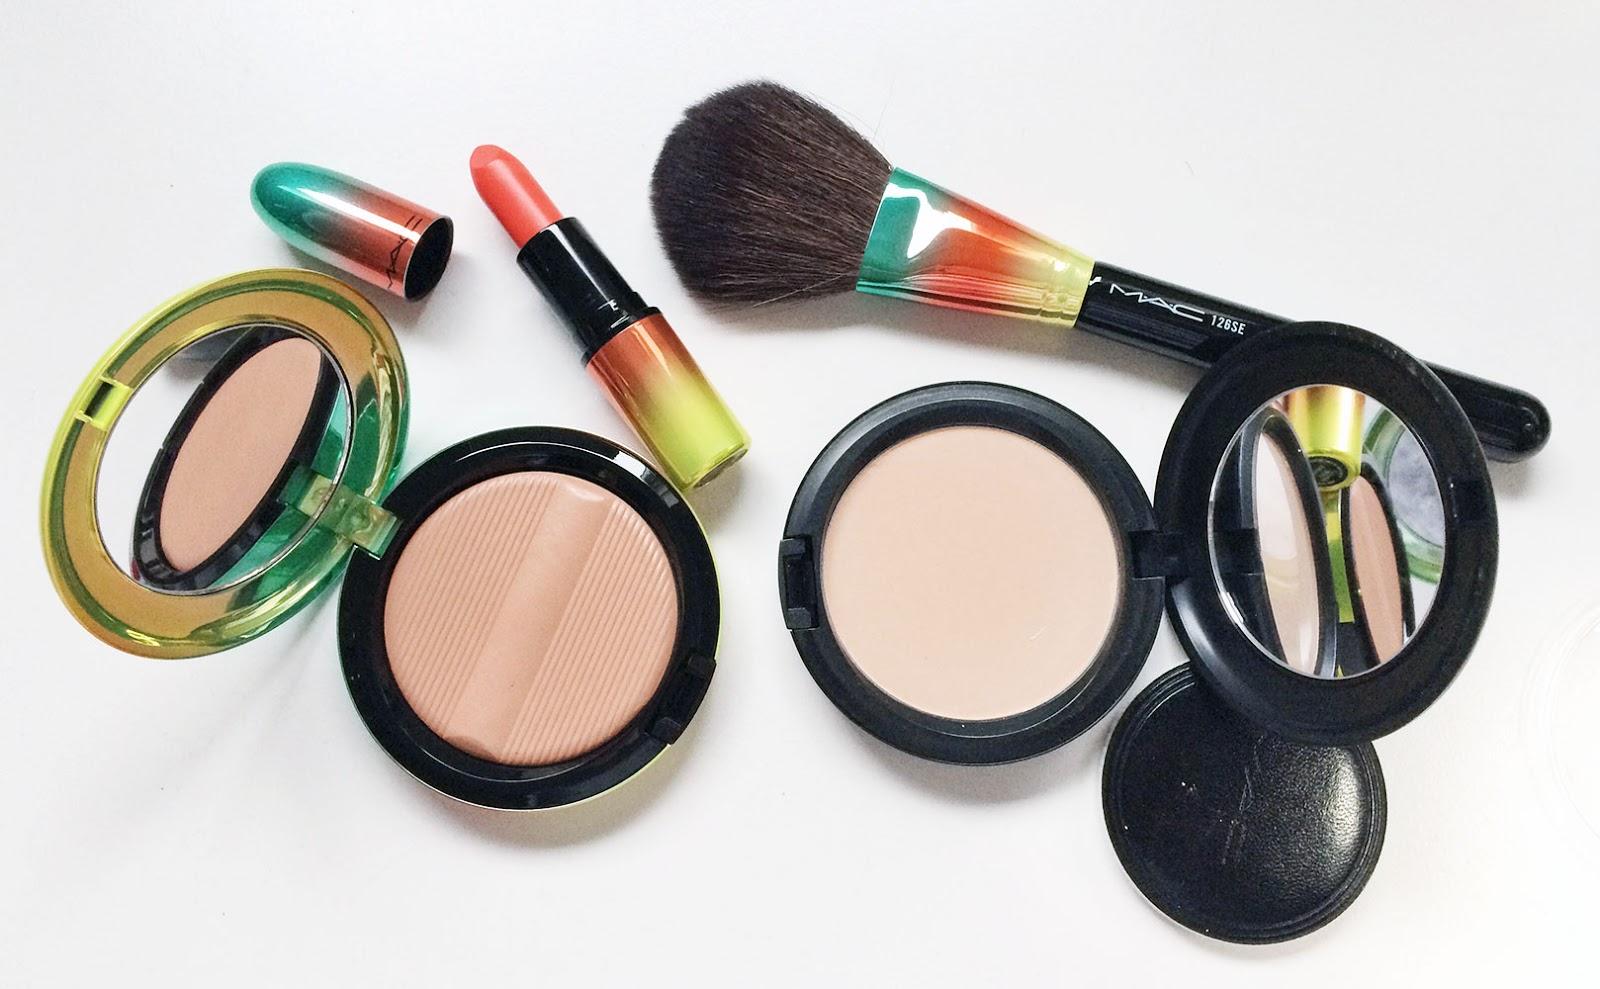 MAC Morange Lipstick & MAC Golden Rinse Bronzer Review Swatches